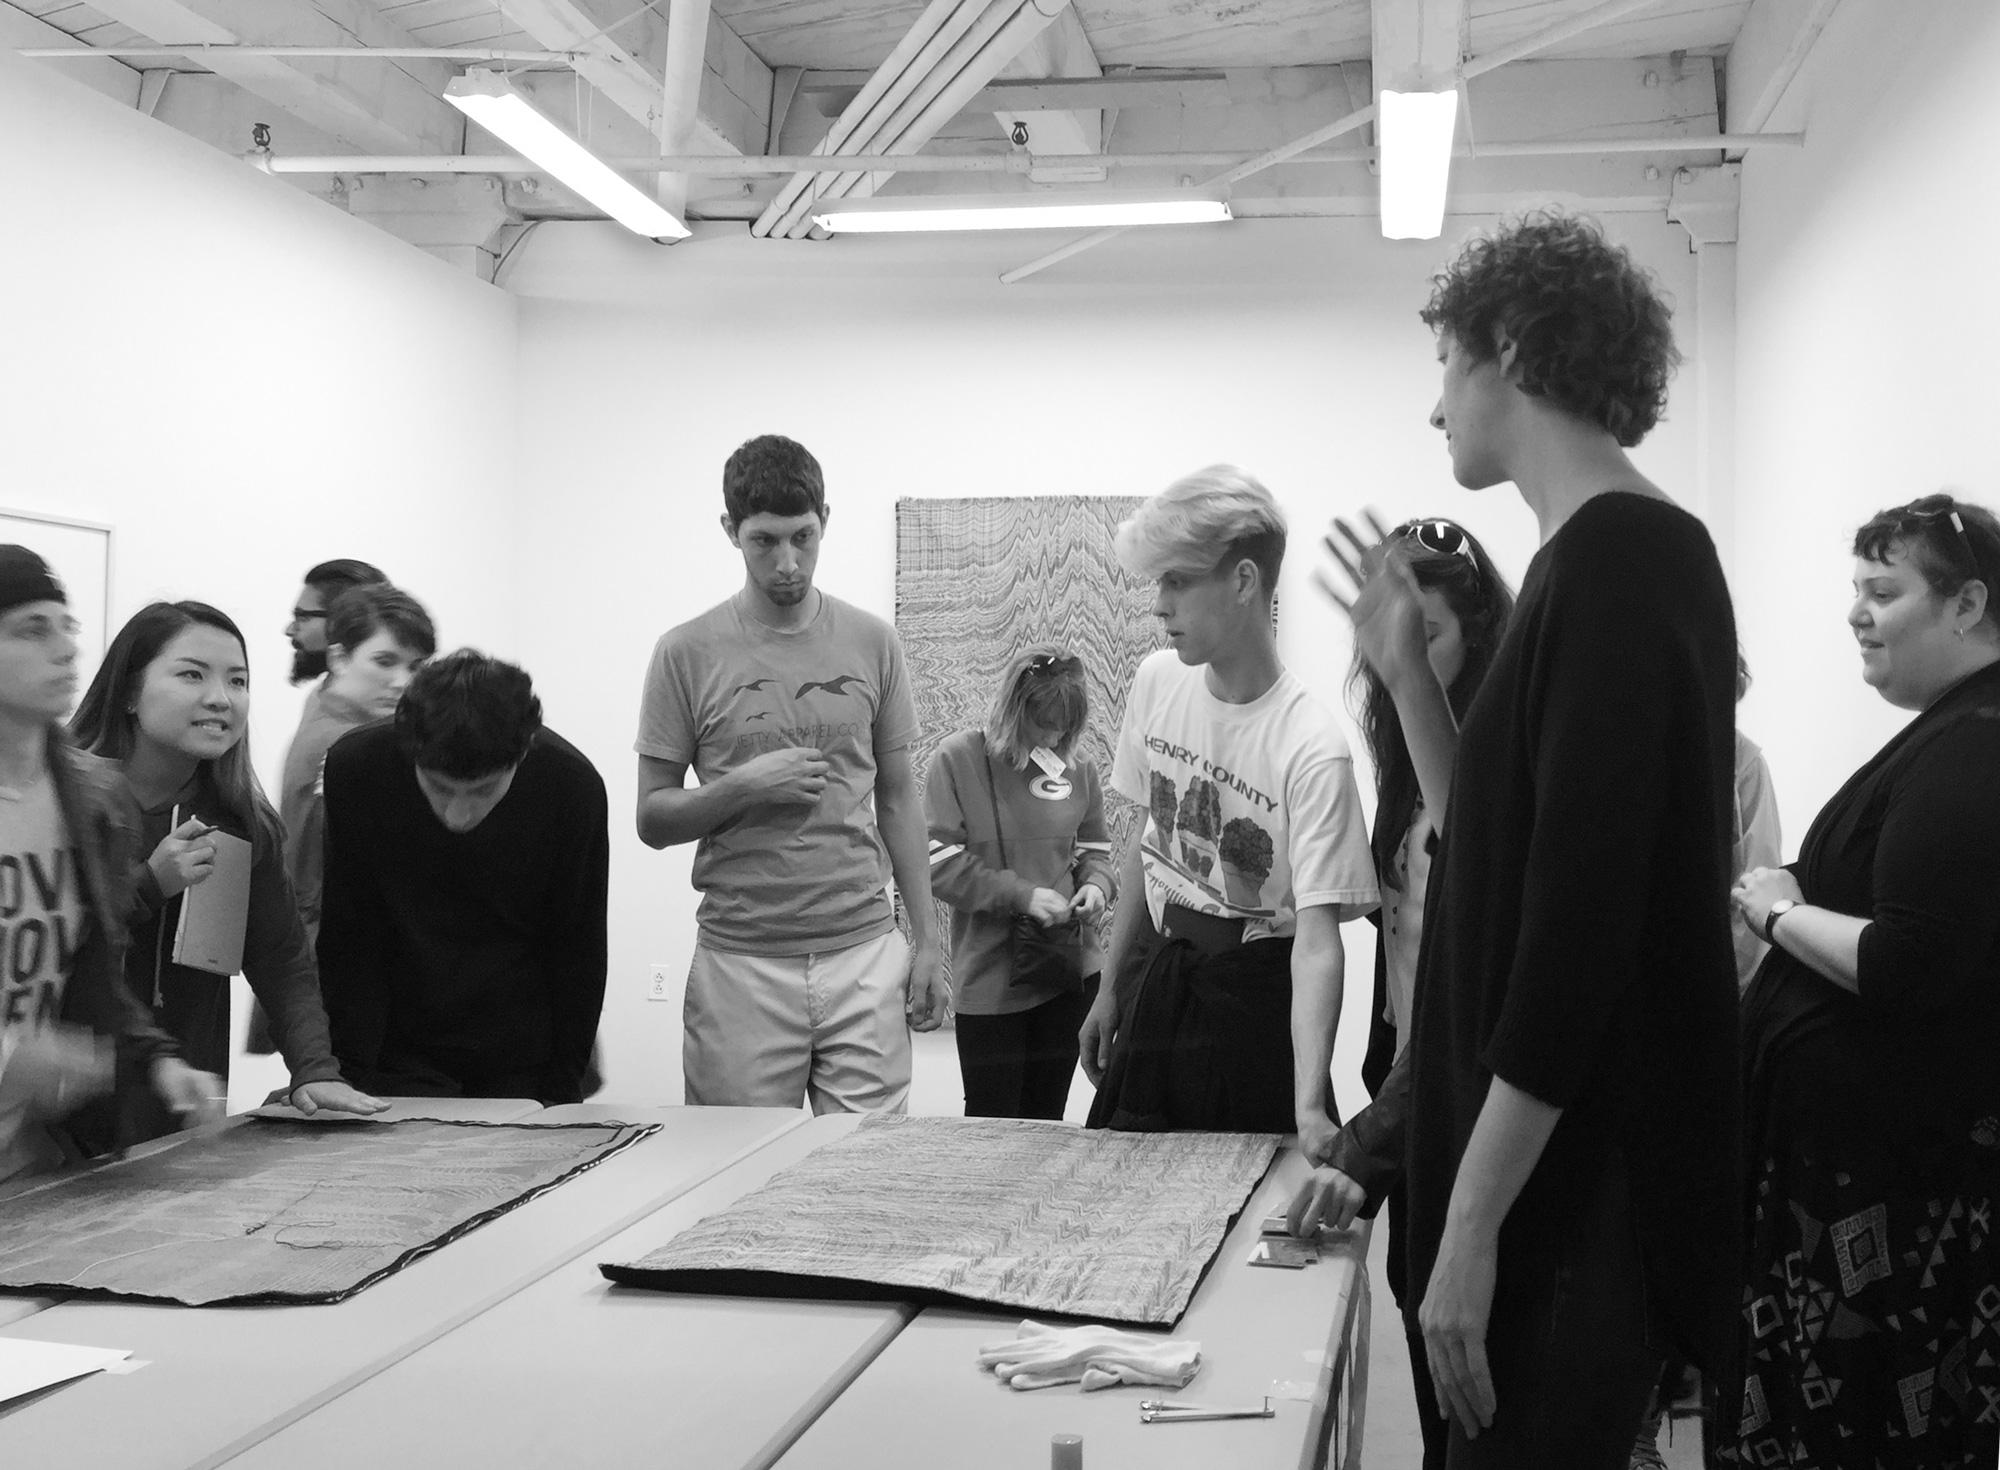 Visiting school in the studio (Brooklyn, NY)  Interim Semester Seminar  w/Prof. Shindelman University of Georgia, School of Art, 2016